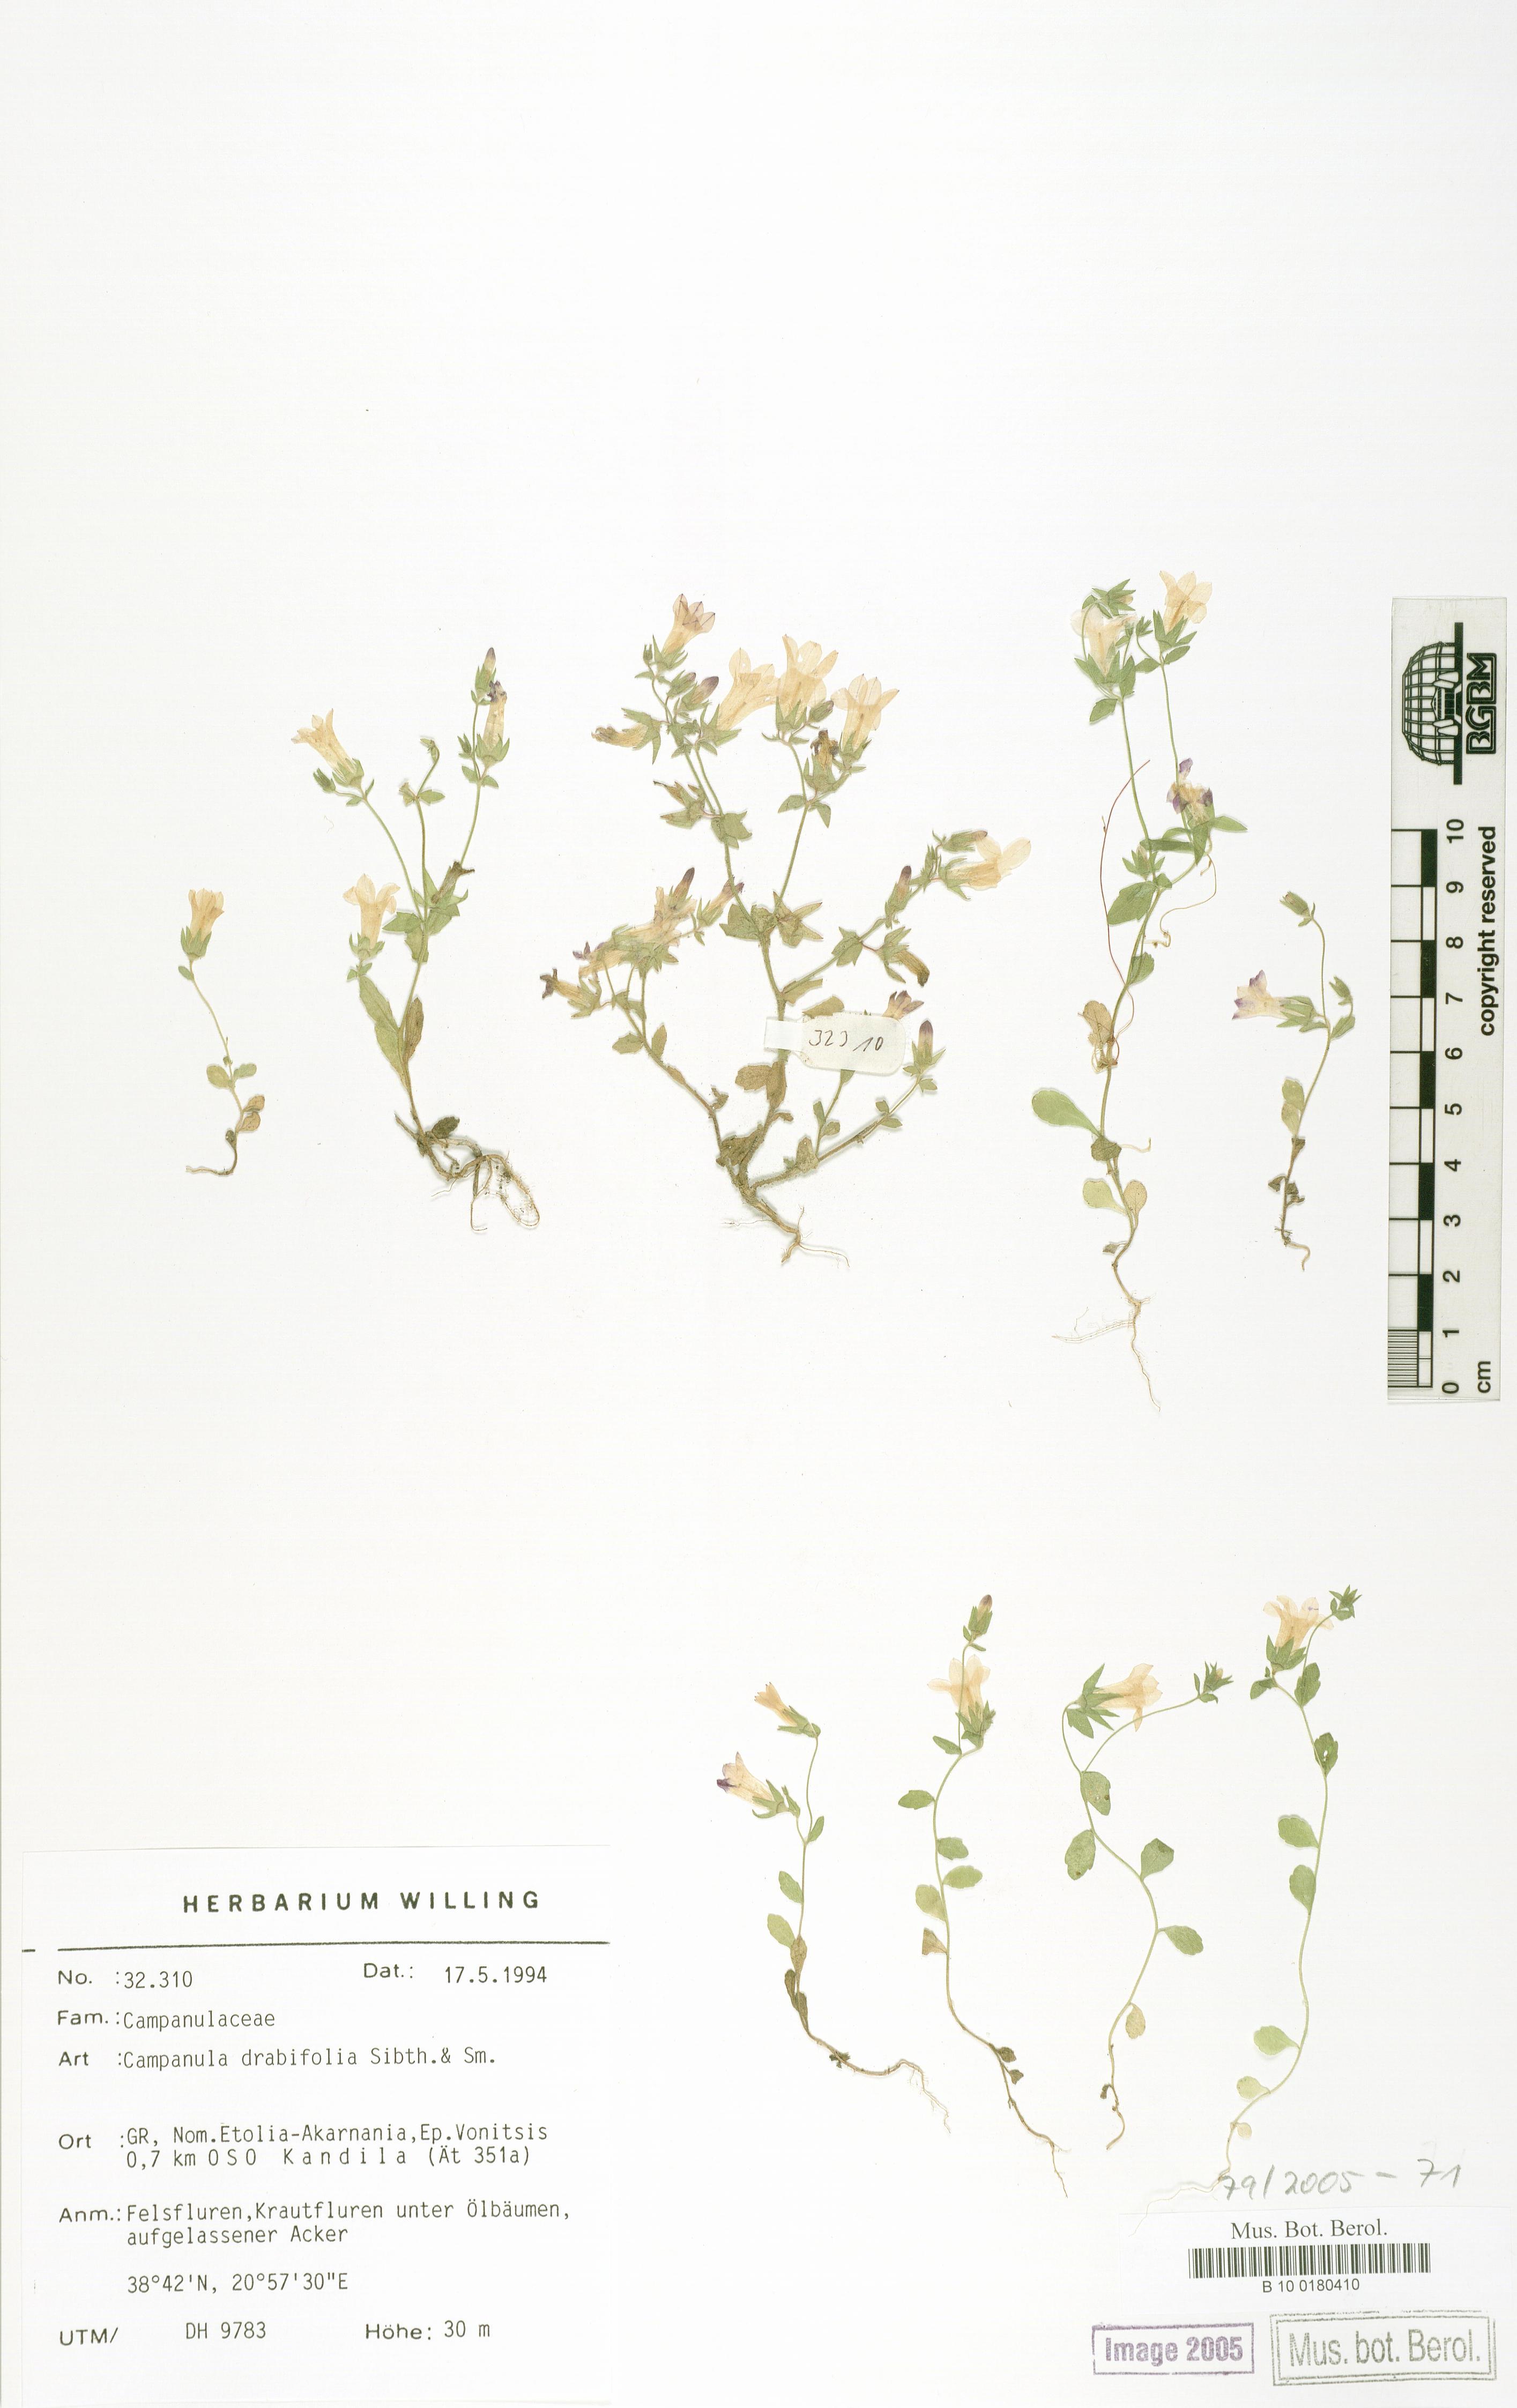 http://ww2.bgbm.org/herbarium/images/B/10/01/80/41/B_10_0180410.jpg